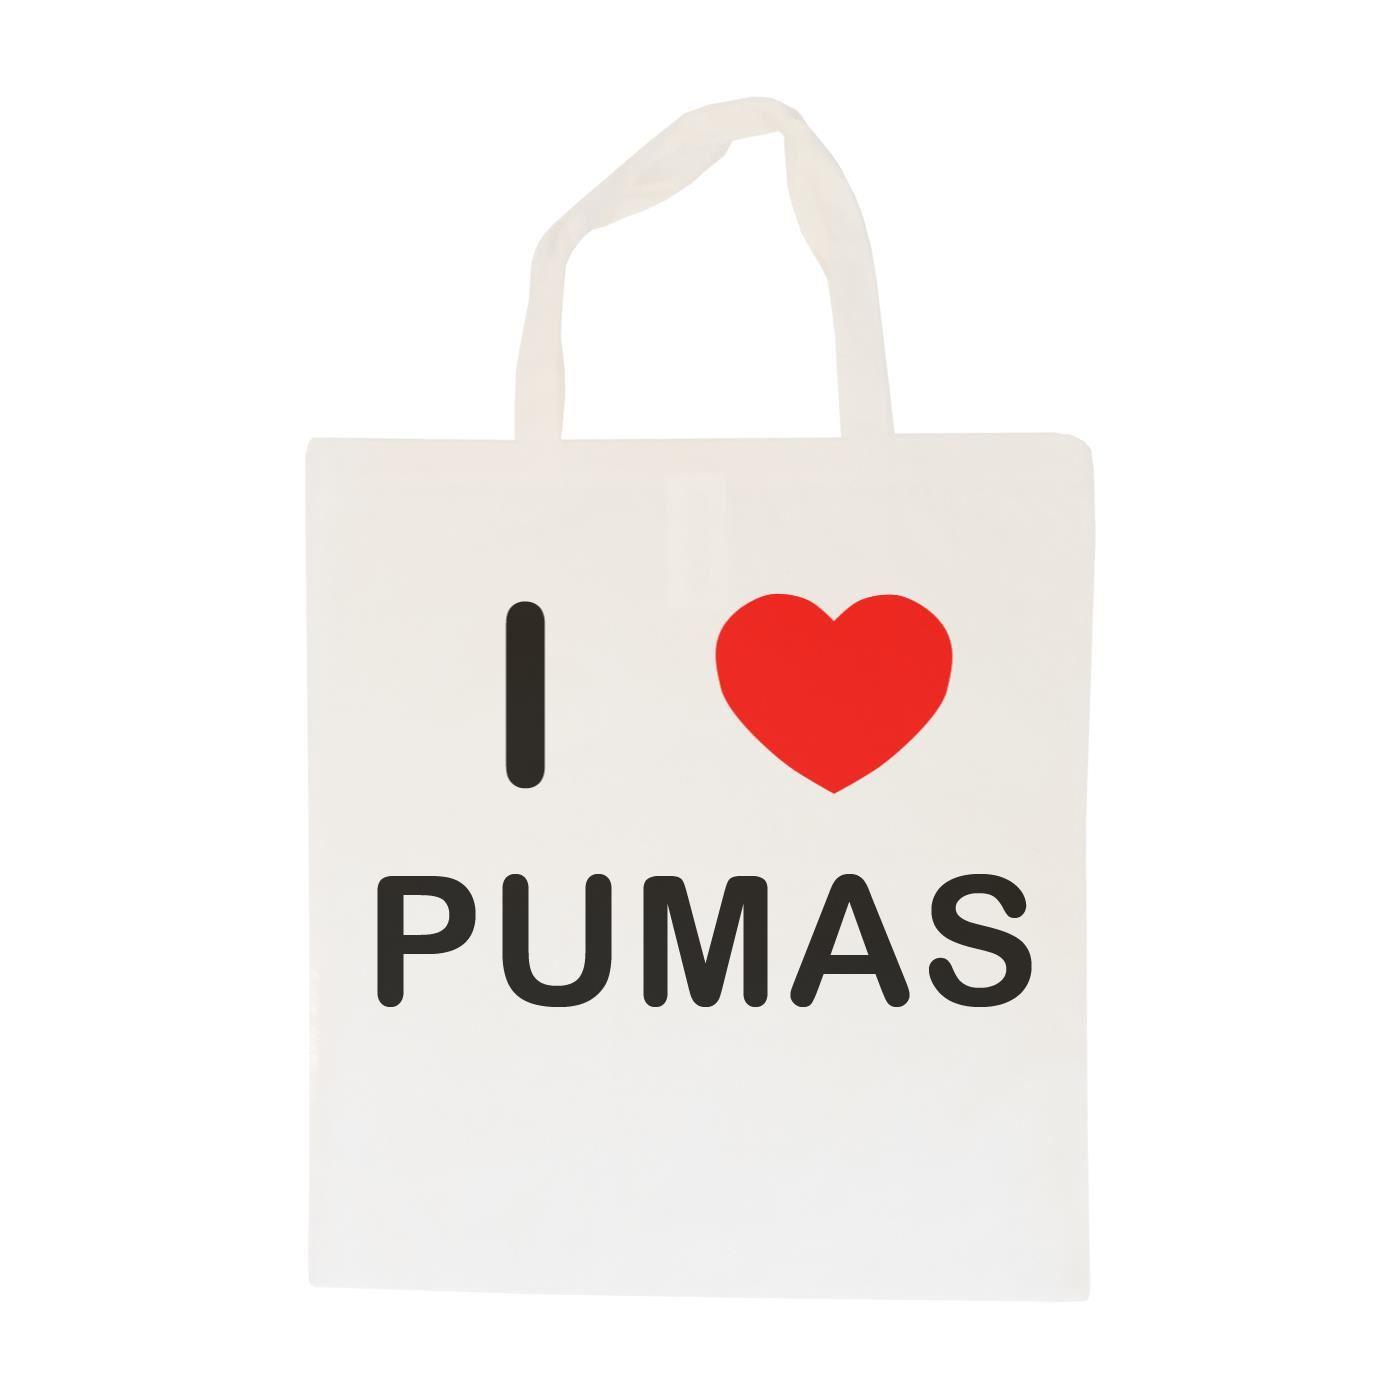 I Love Pumas - Cotton Bag | Size choice Tote, Shopper or Sling